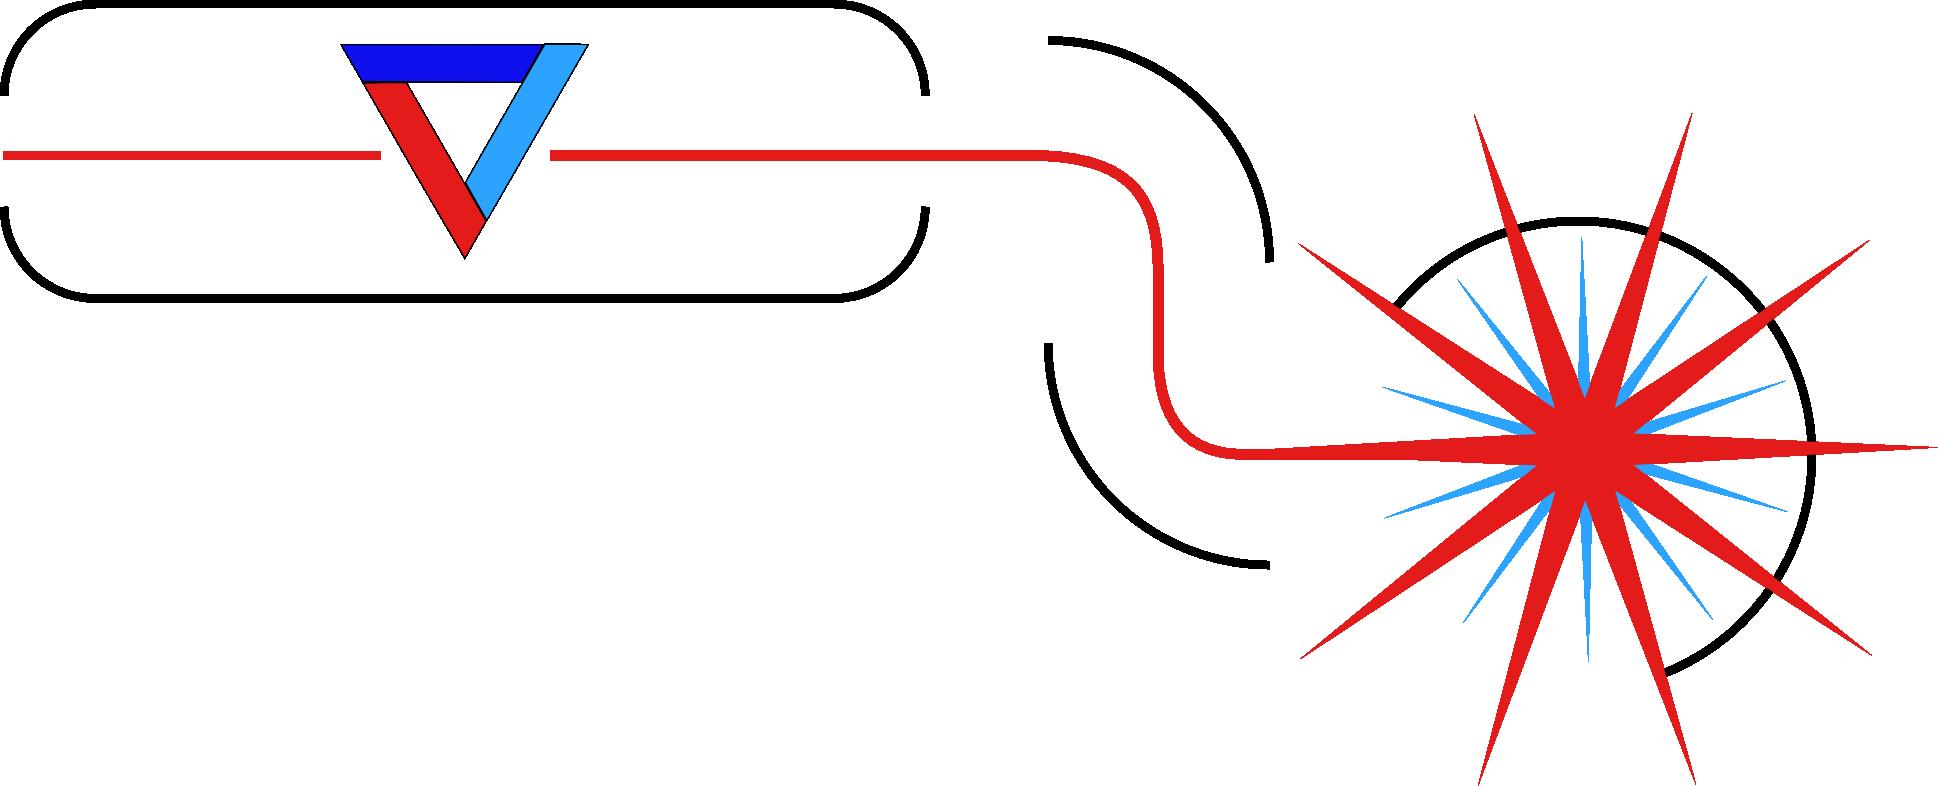 fenrislogo-notext